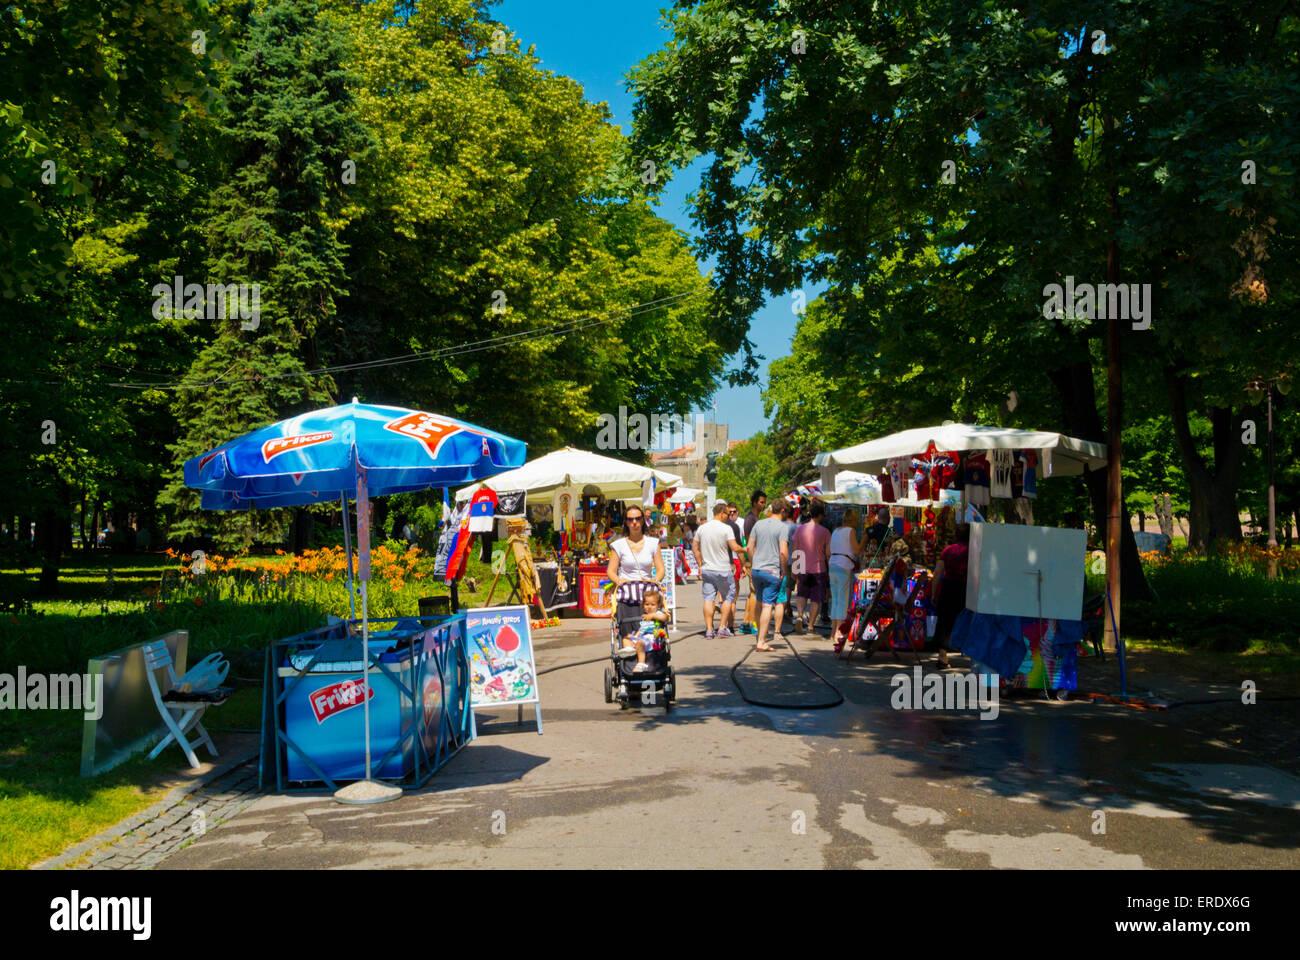 Kalemegdan fortress park, Belgrade, Serbia, Southeastern Europe - Stock Image